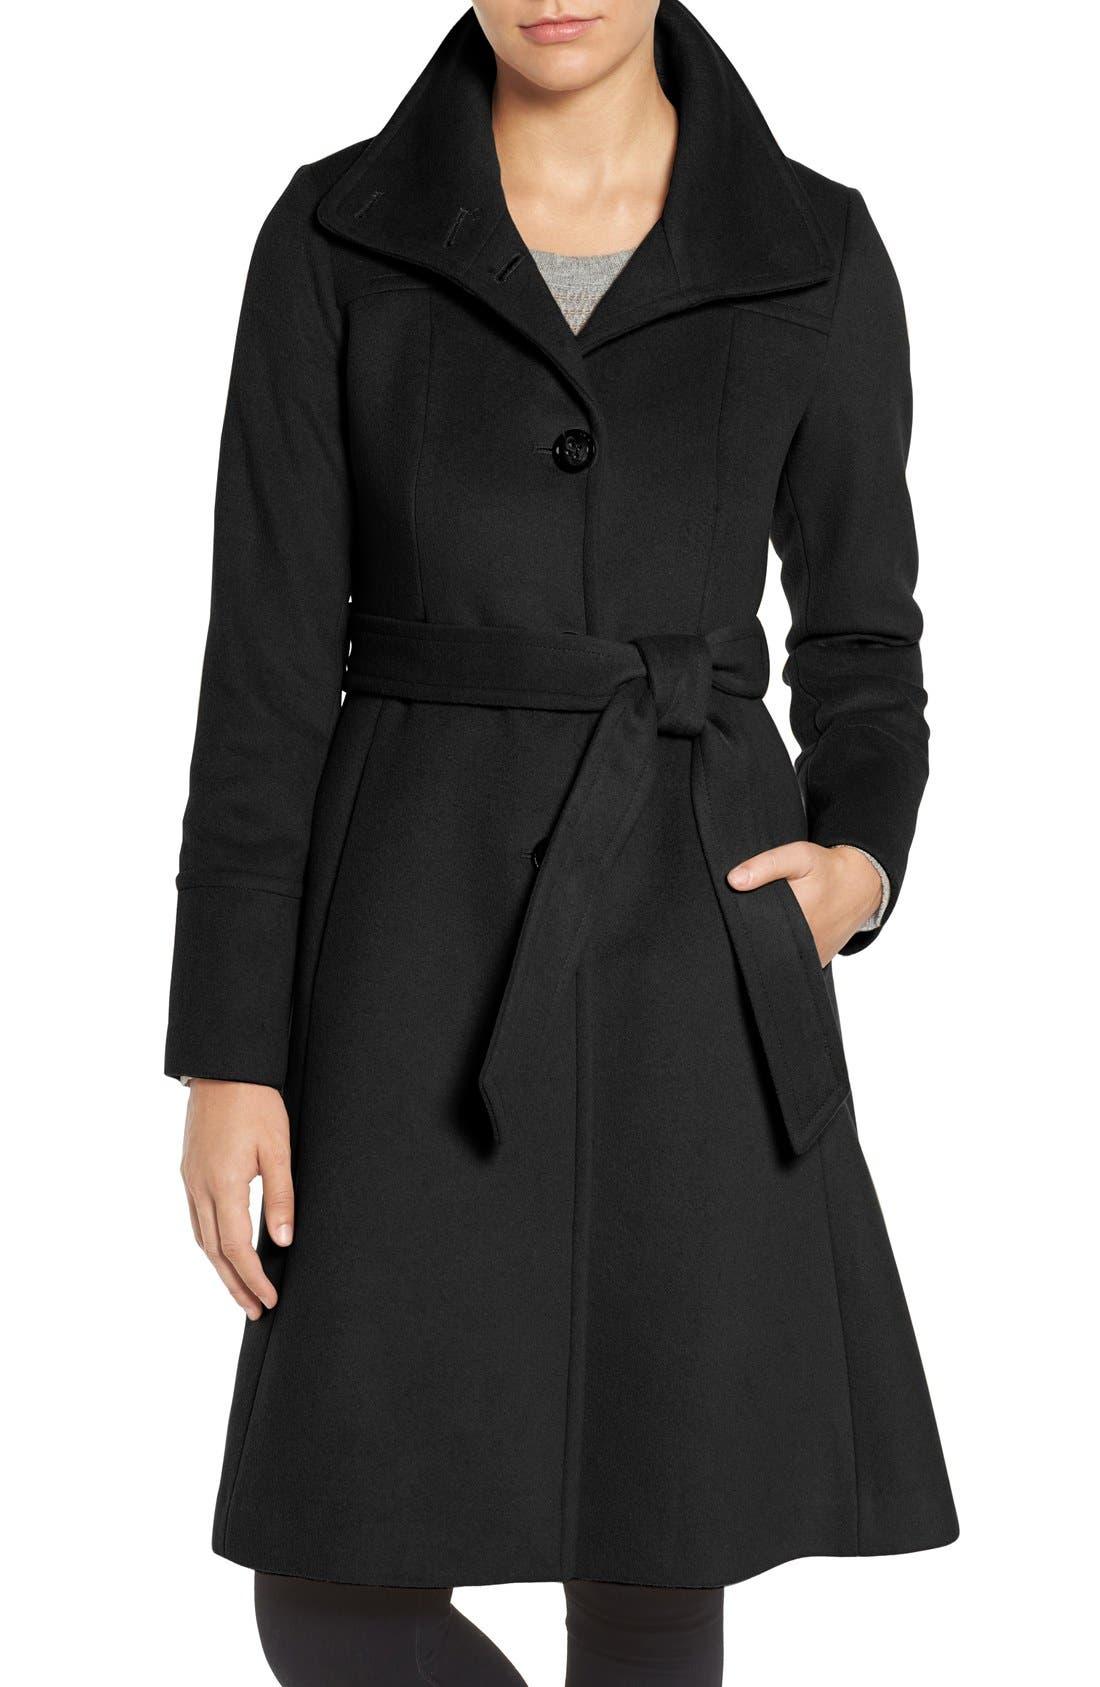 Alternate Image 1 Selected - Eliza J Luxe Wool Blend Belted Long A-Line Coat